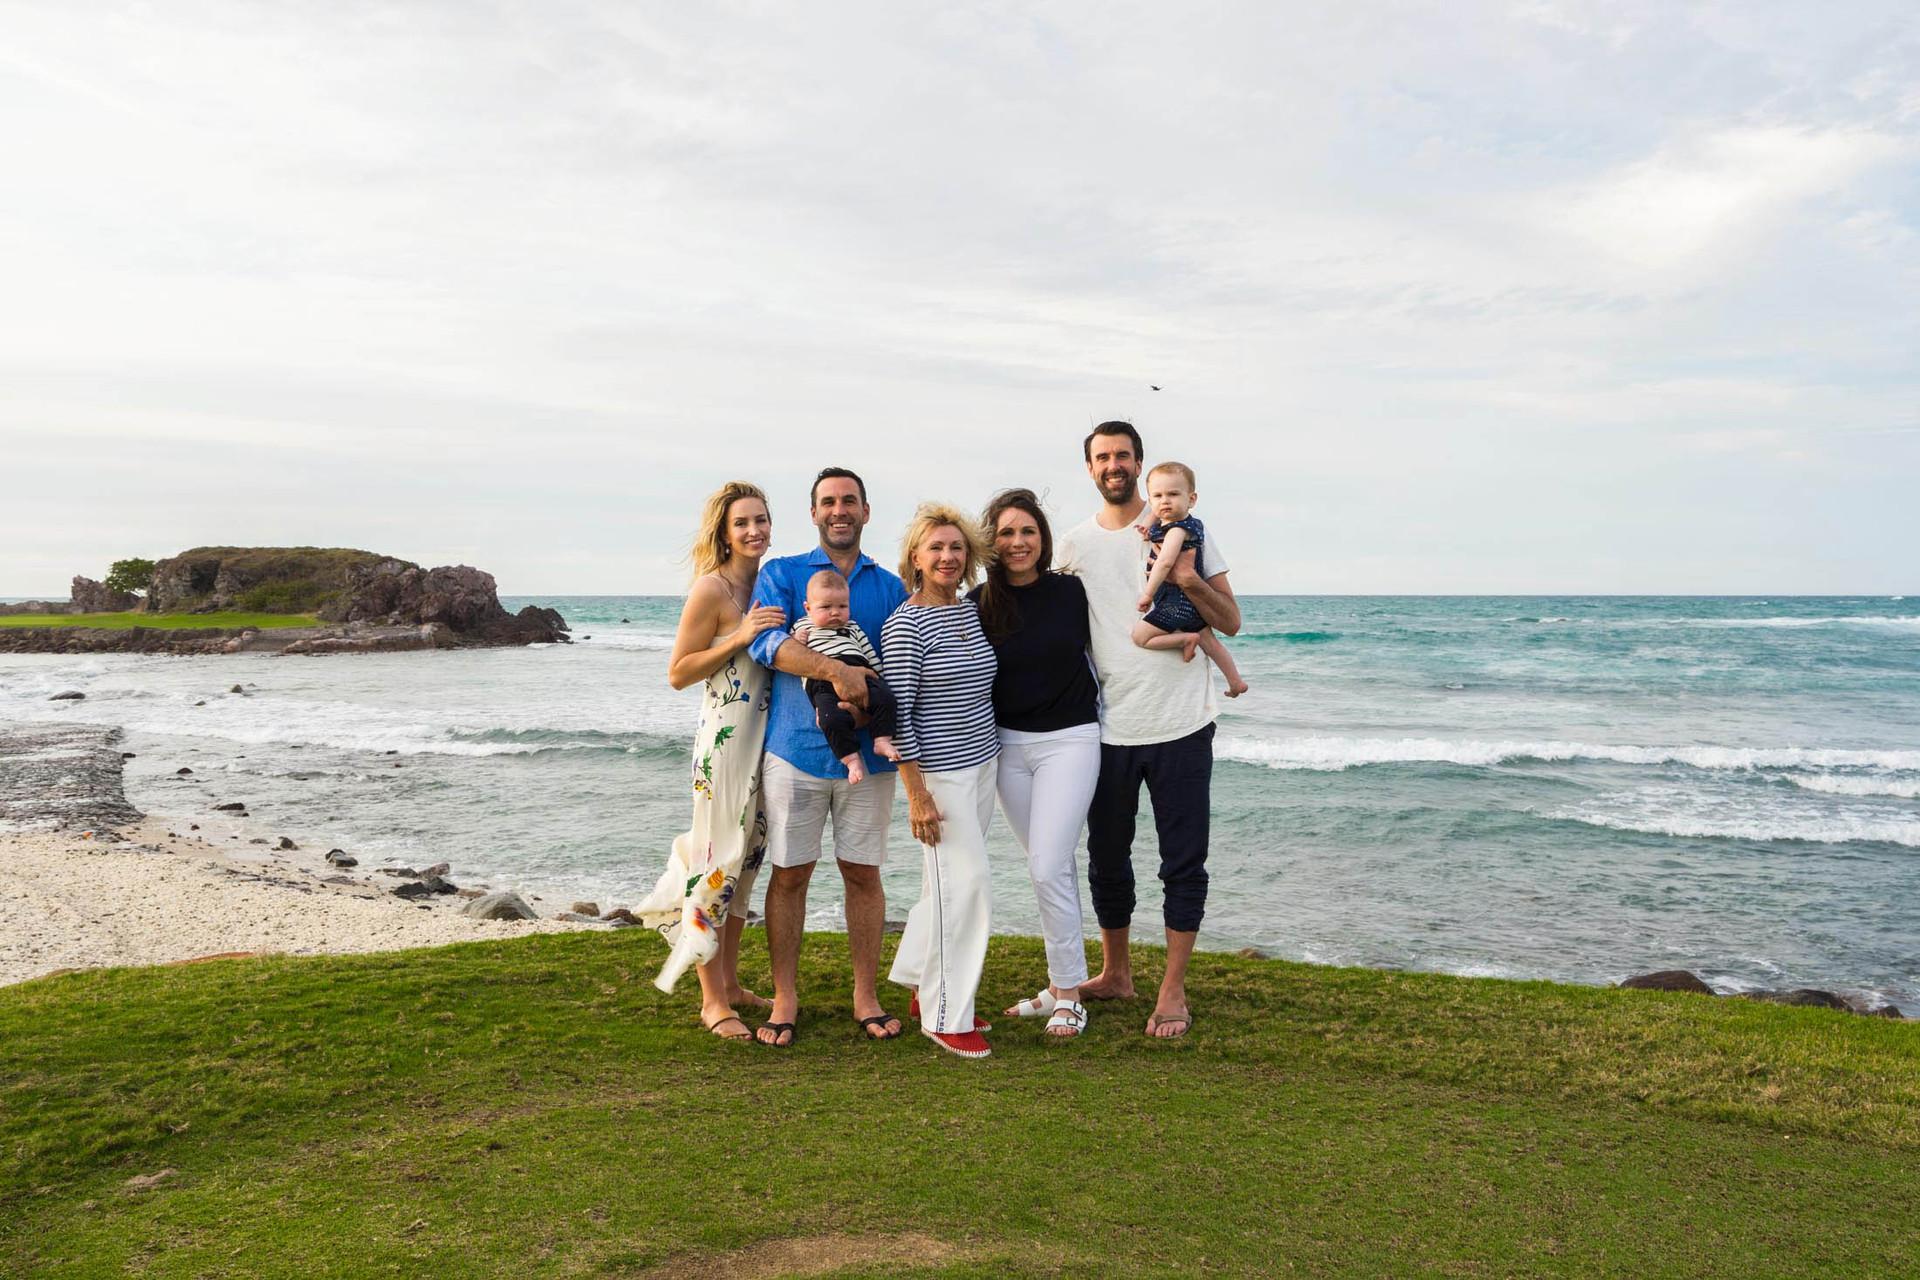 punta_mita_photographer_family_photoshoo